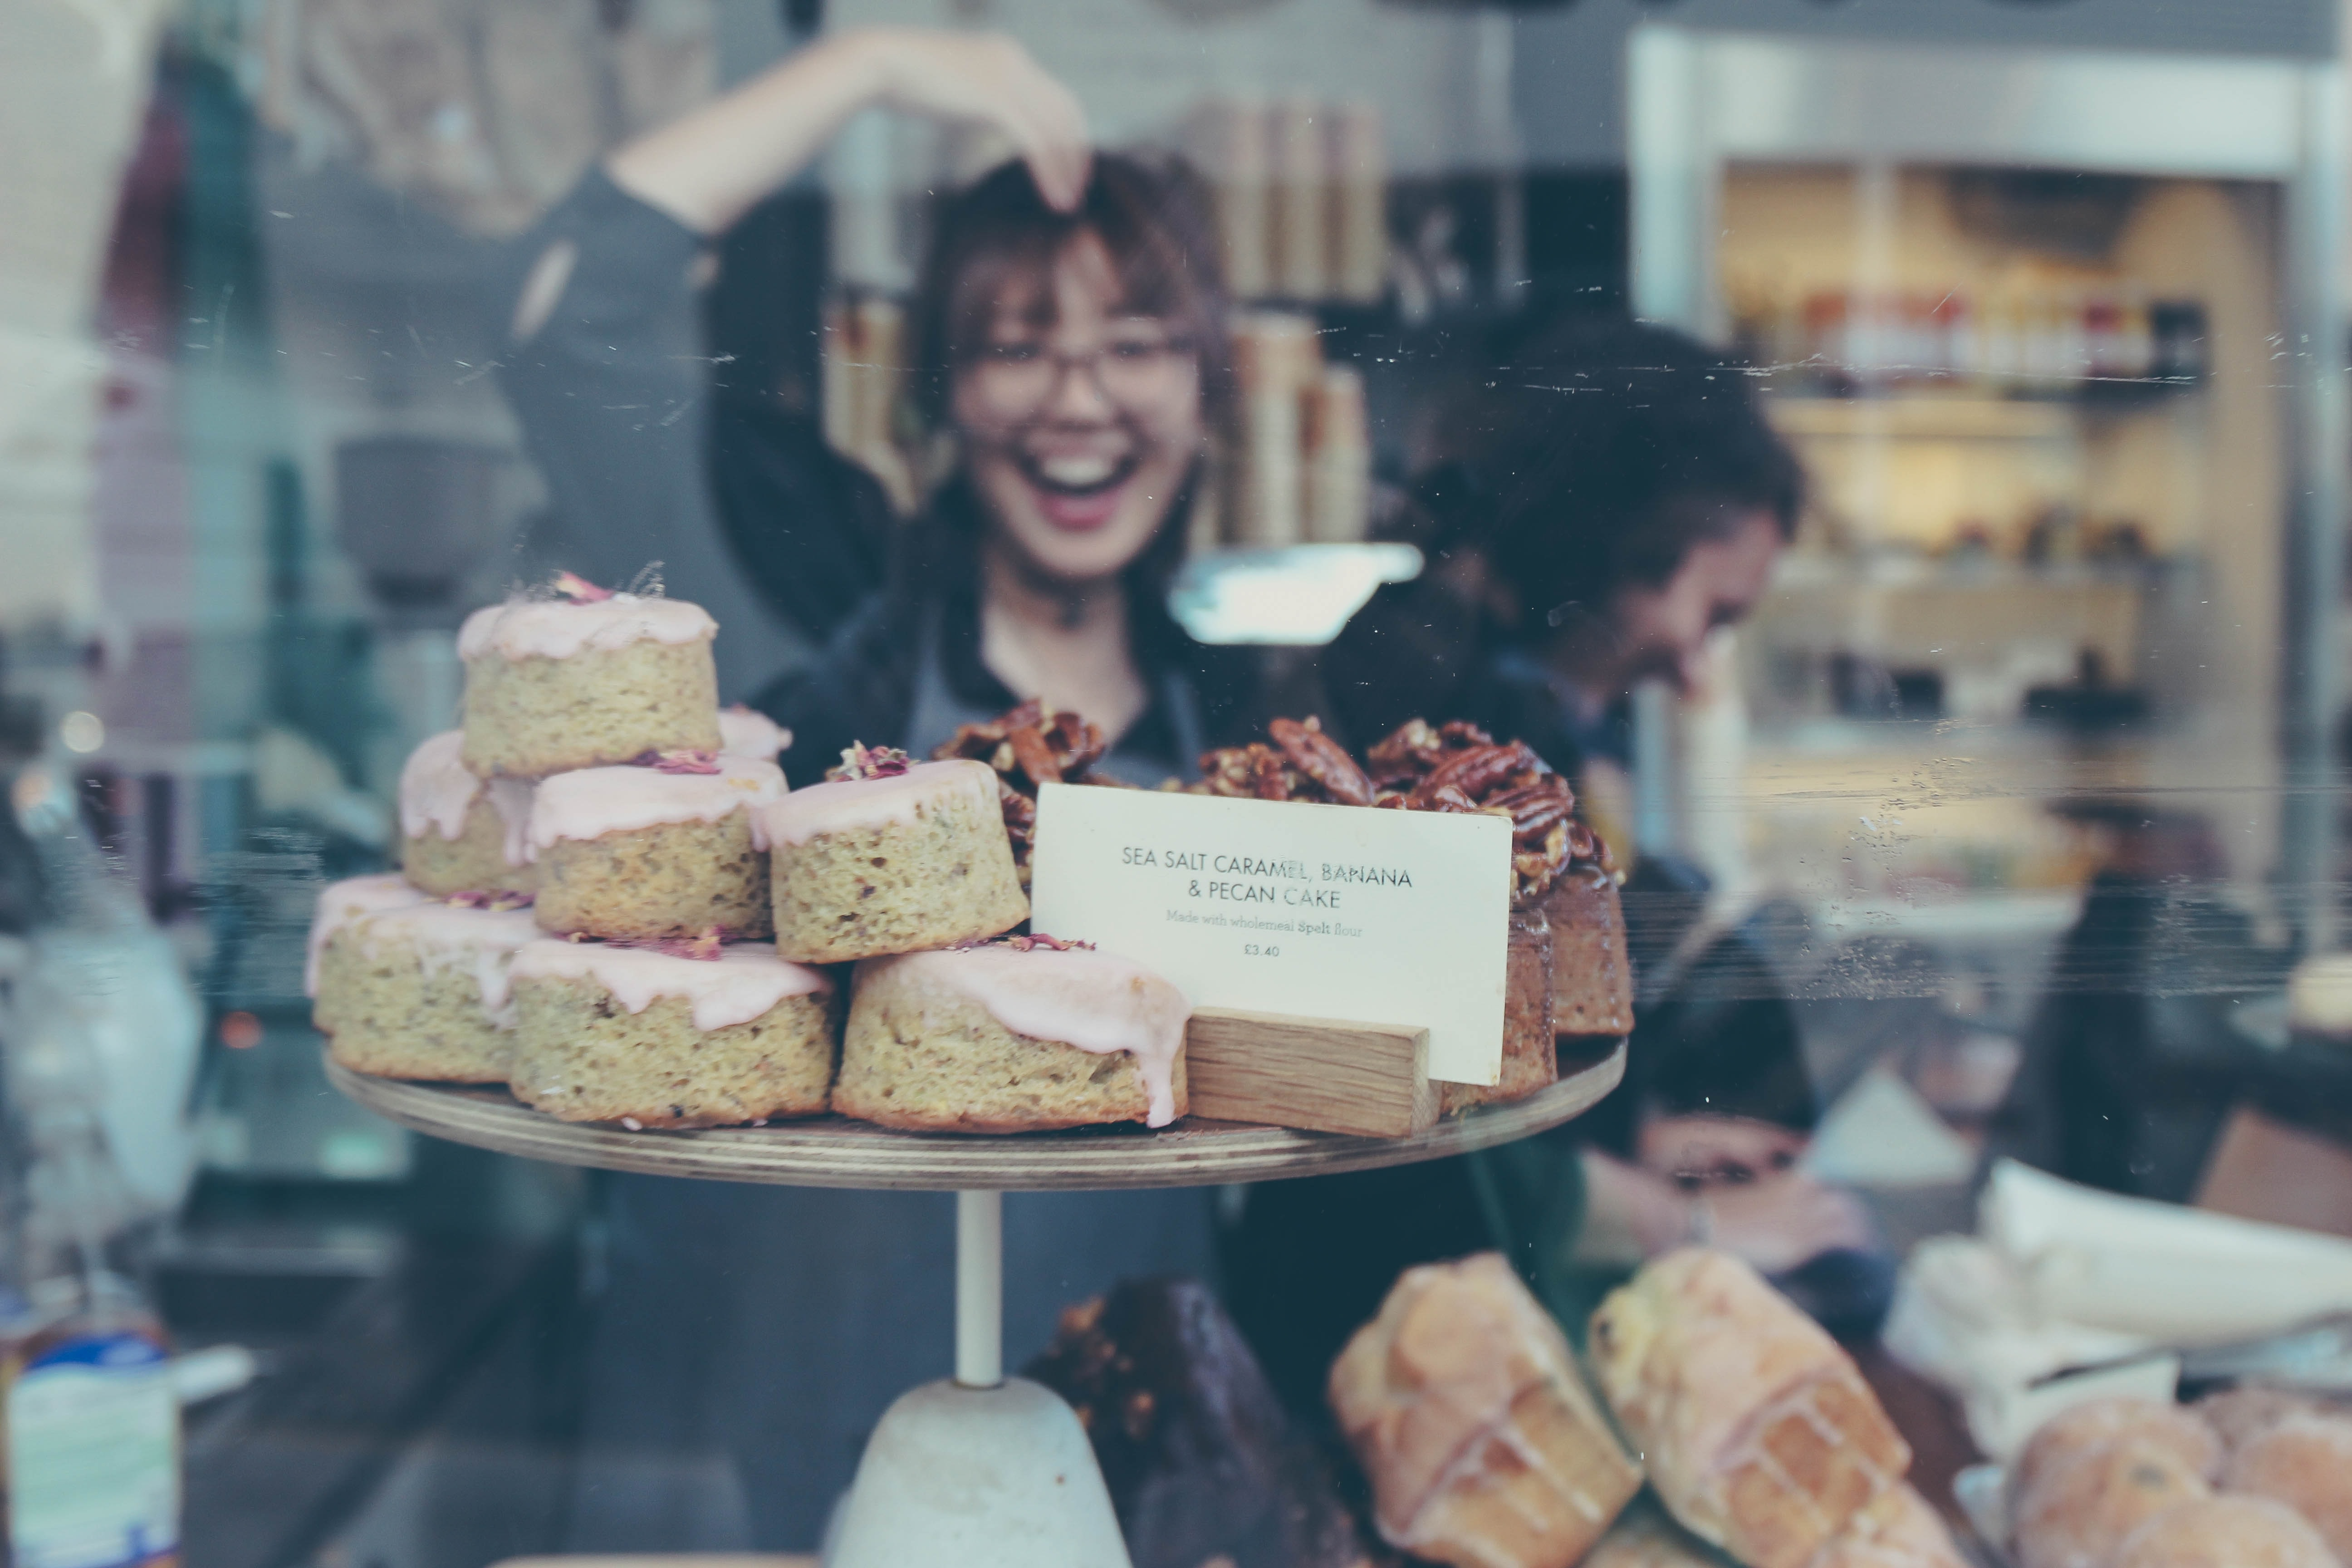 reflection of smiling woman on food display shelf